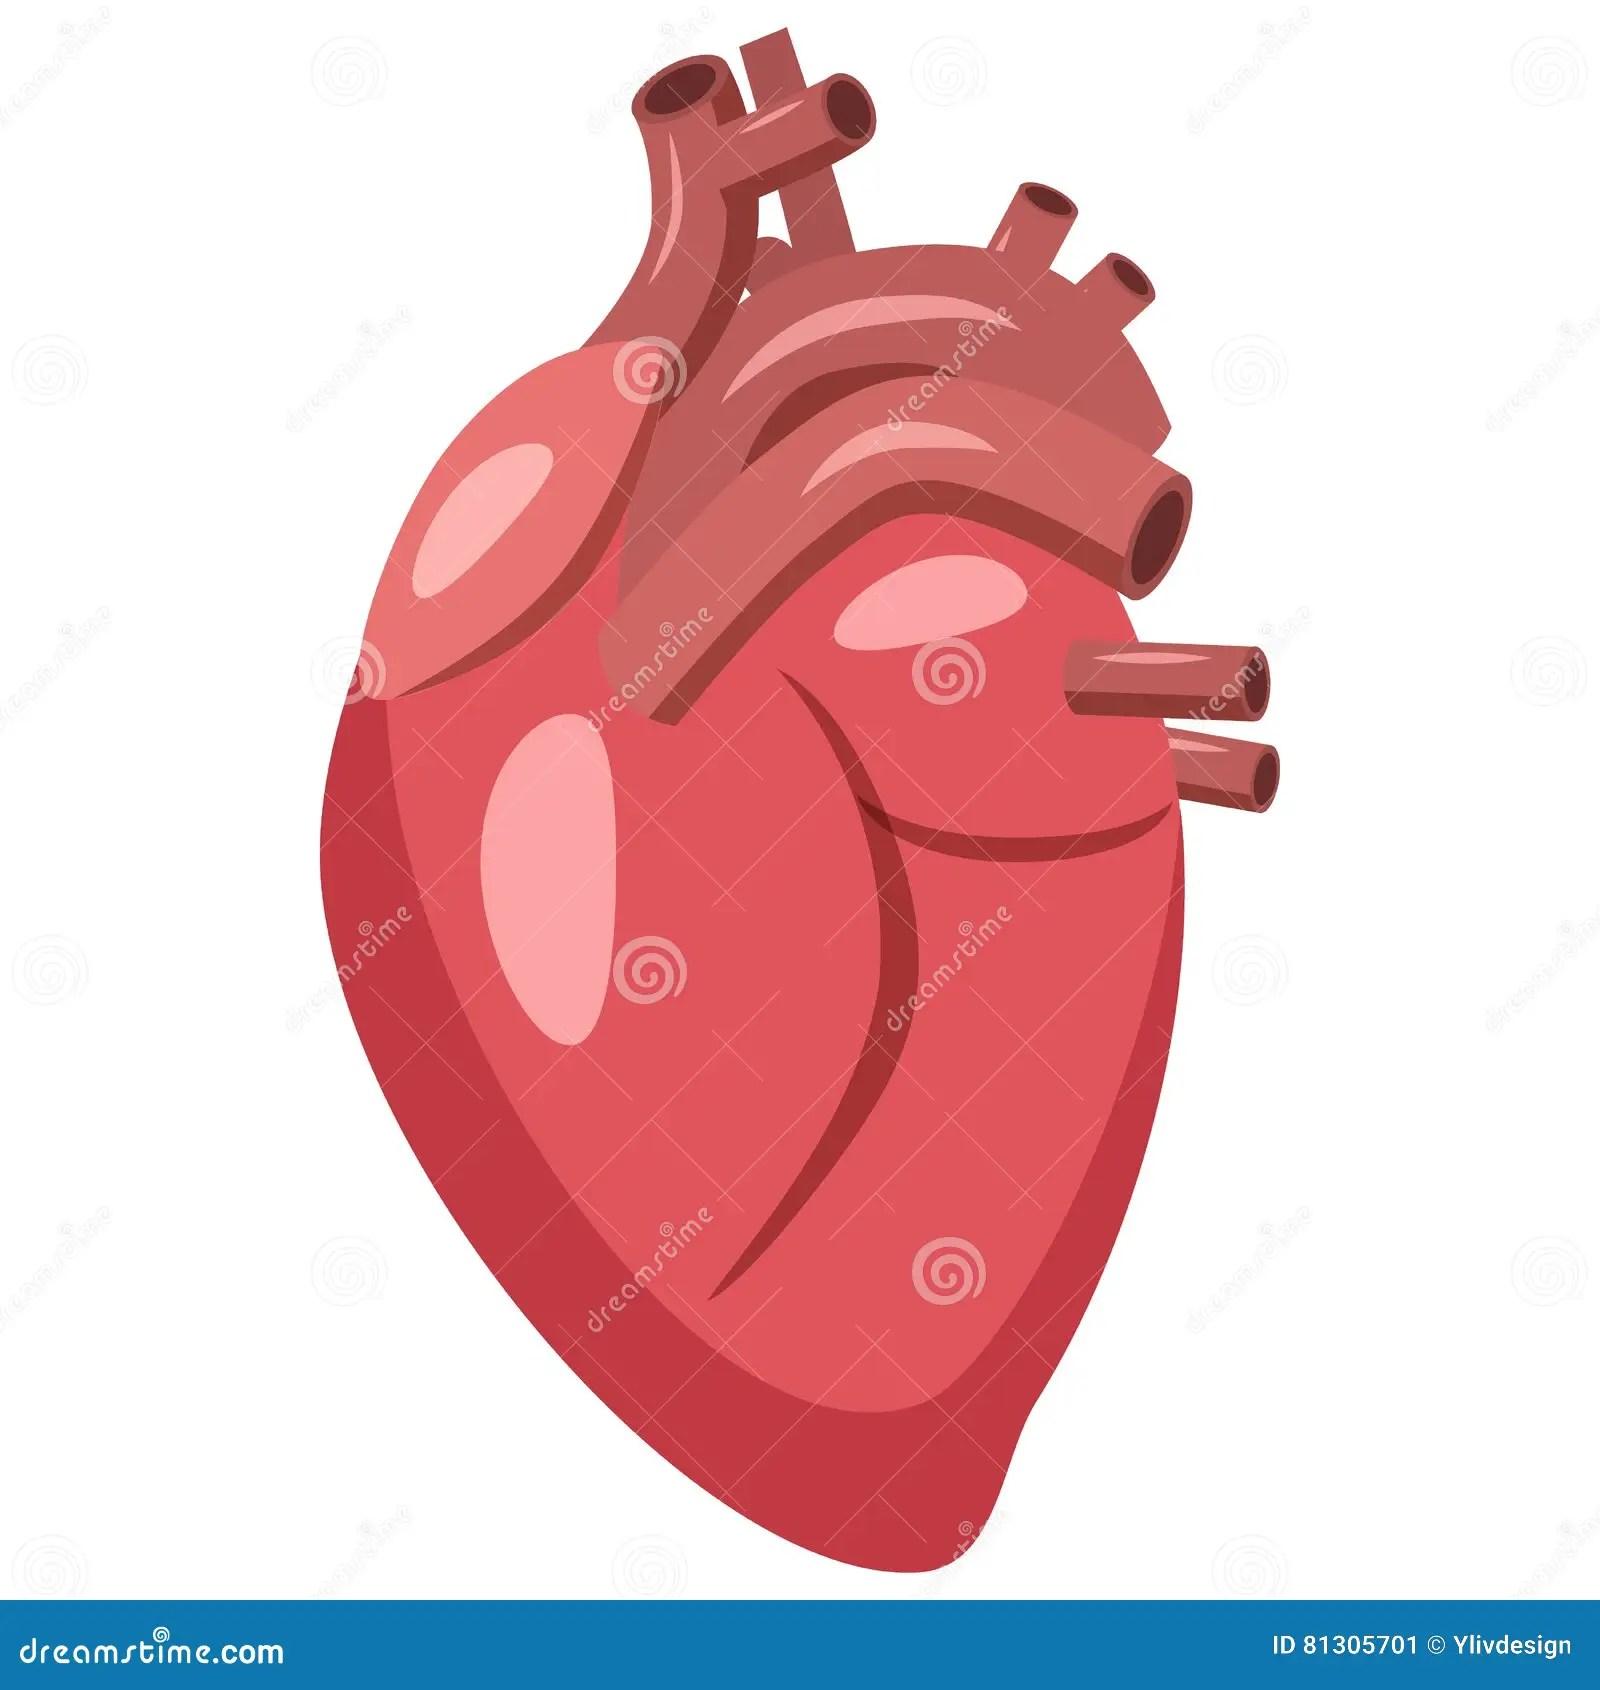 Human Heart Icon Cartoon Style Stock Vector